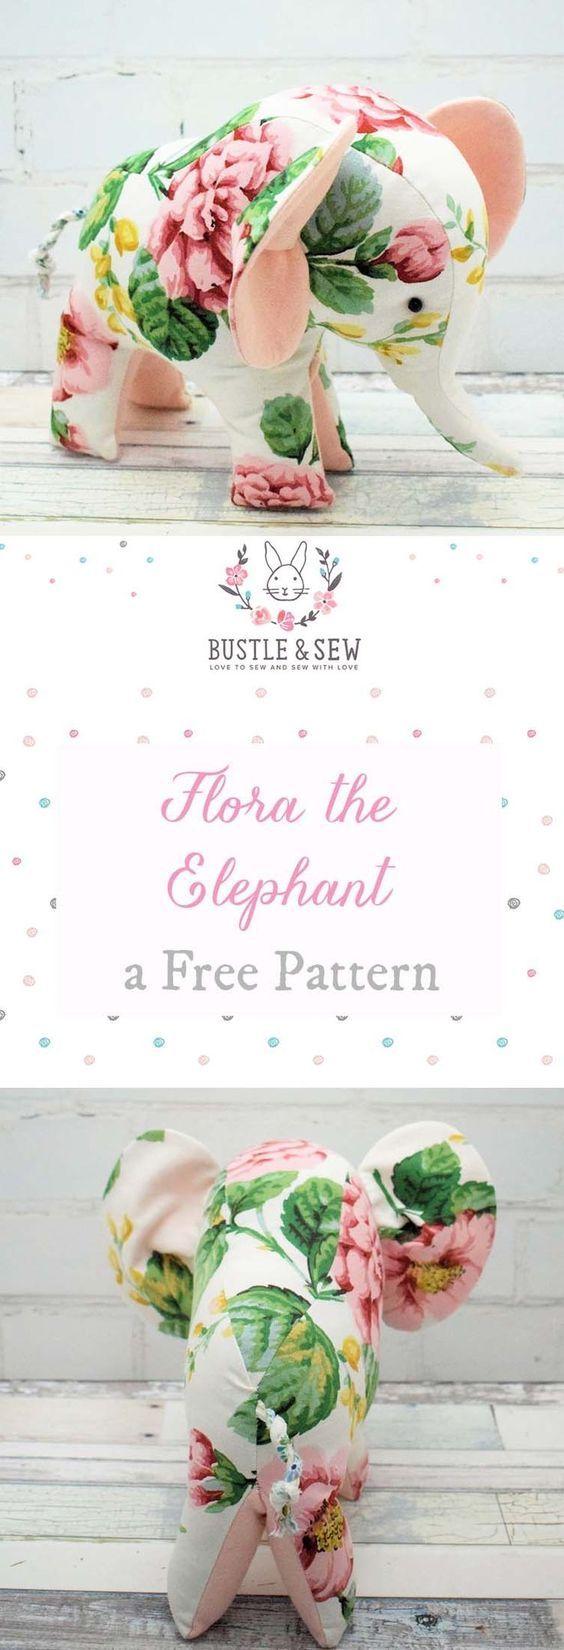 Free flora the elephant pattern adorable stuffed animal sewing free flora the elephant pattern adorable stuffed animal sewing pattern for an elephant jeuxipadfo Gallery